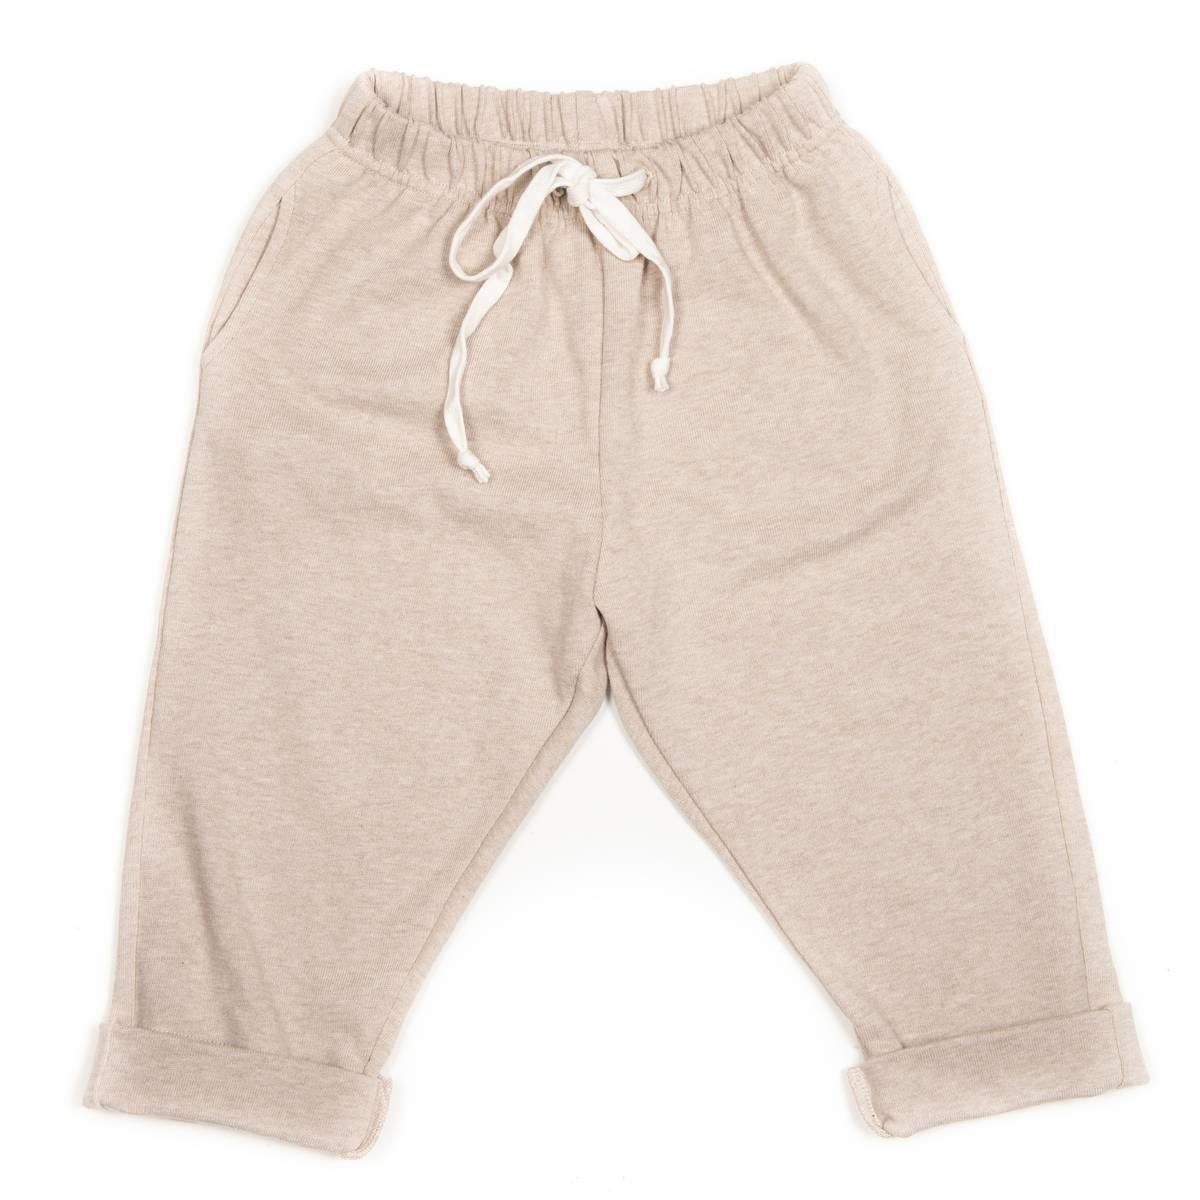 HUTTELiHUT JOG pants heavy jersey - camel